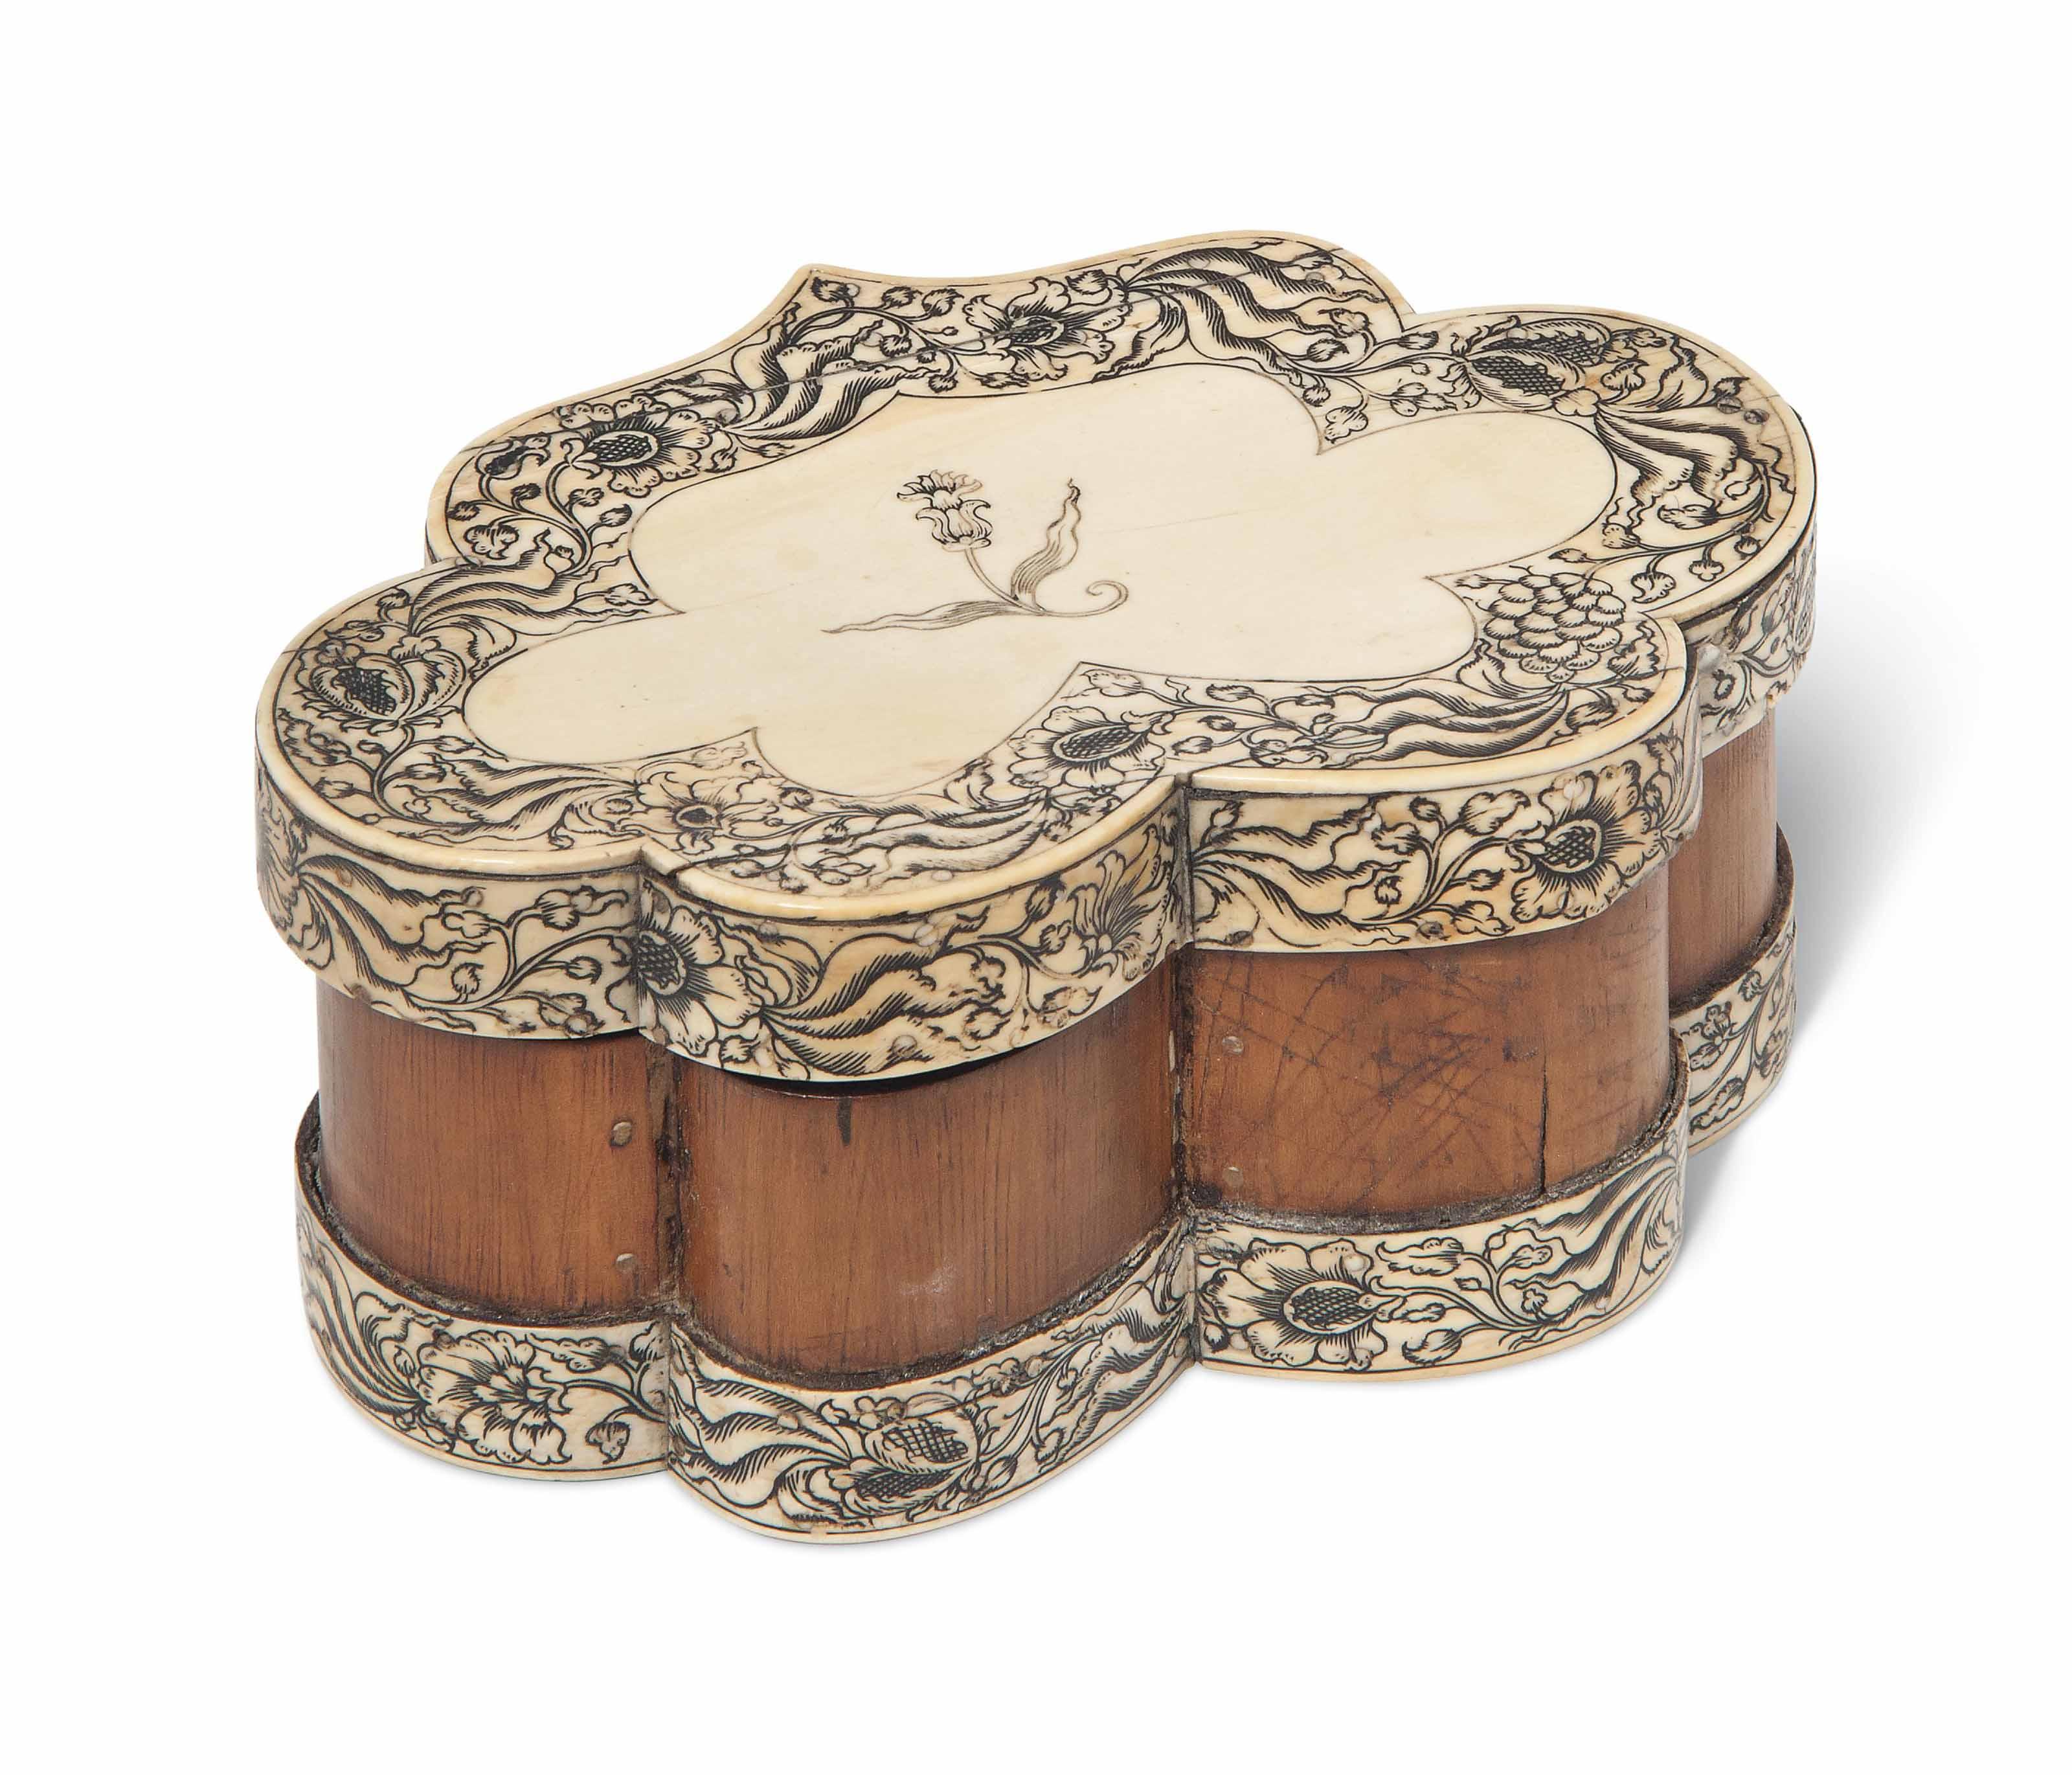 A VIZAGAPATAM IVORY-VENEERED SCALLOPED SANDALWOOD BOX